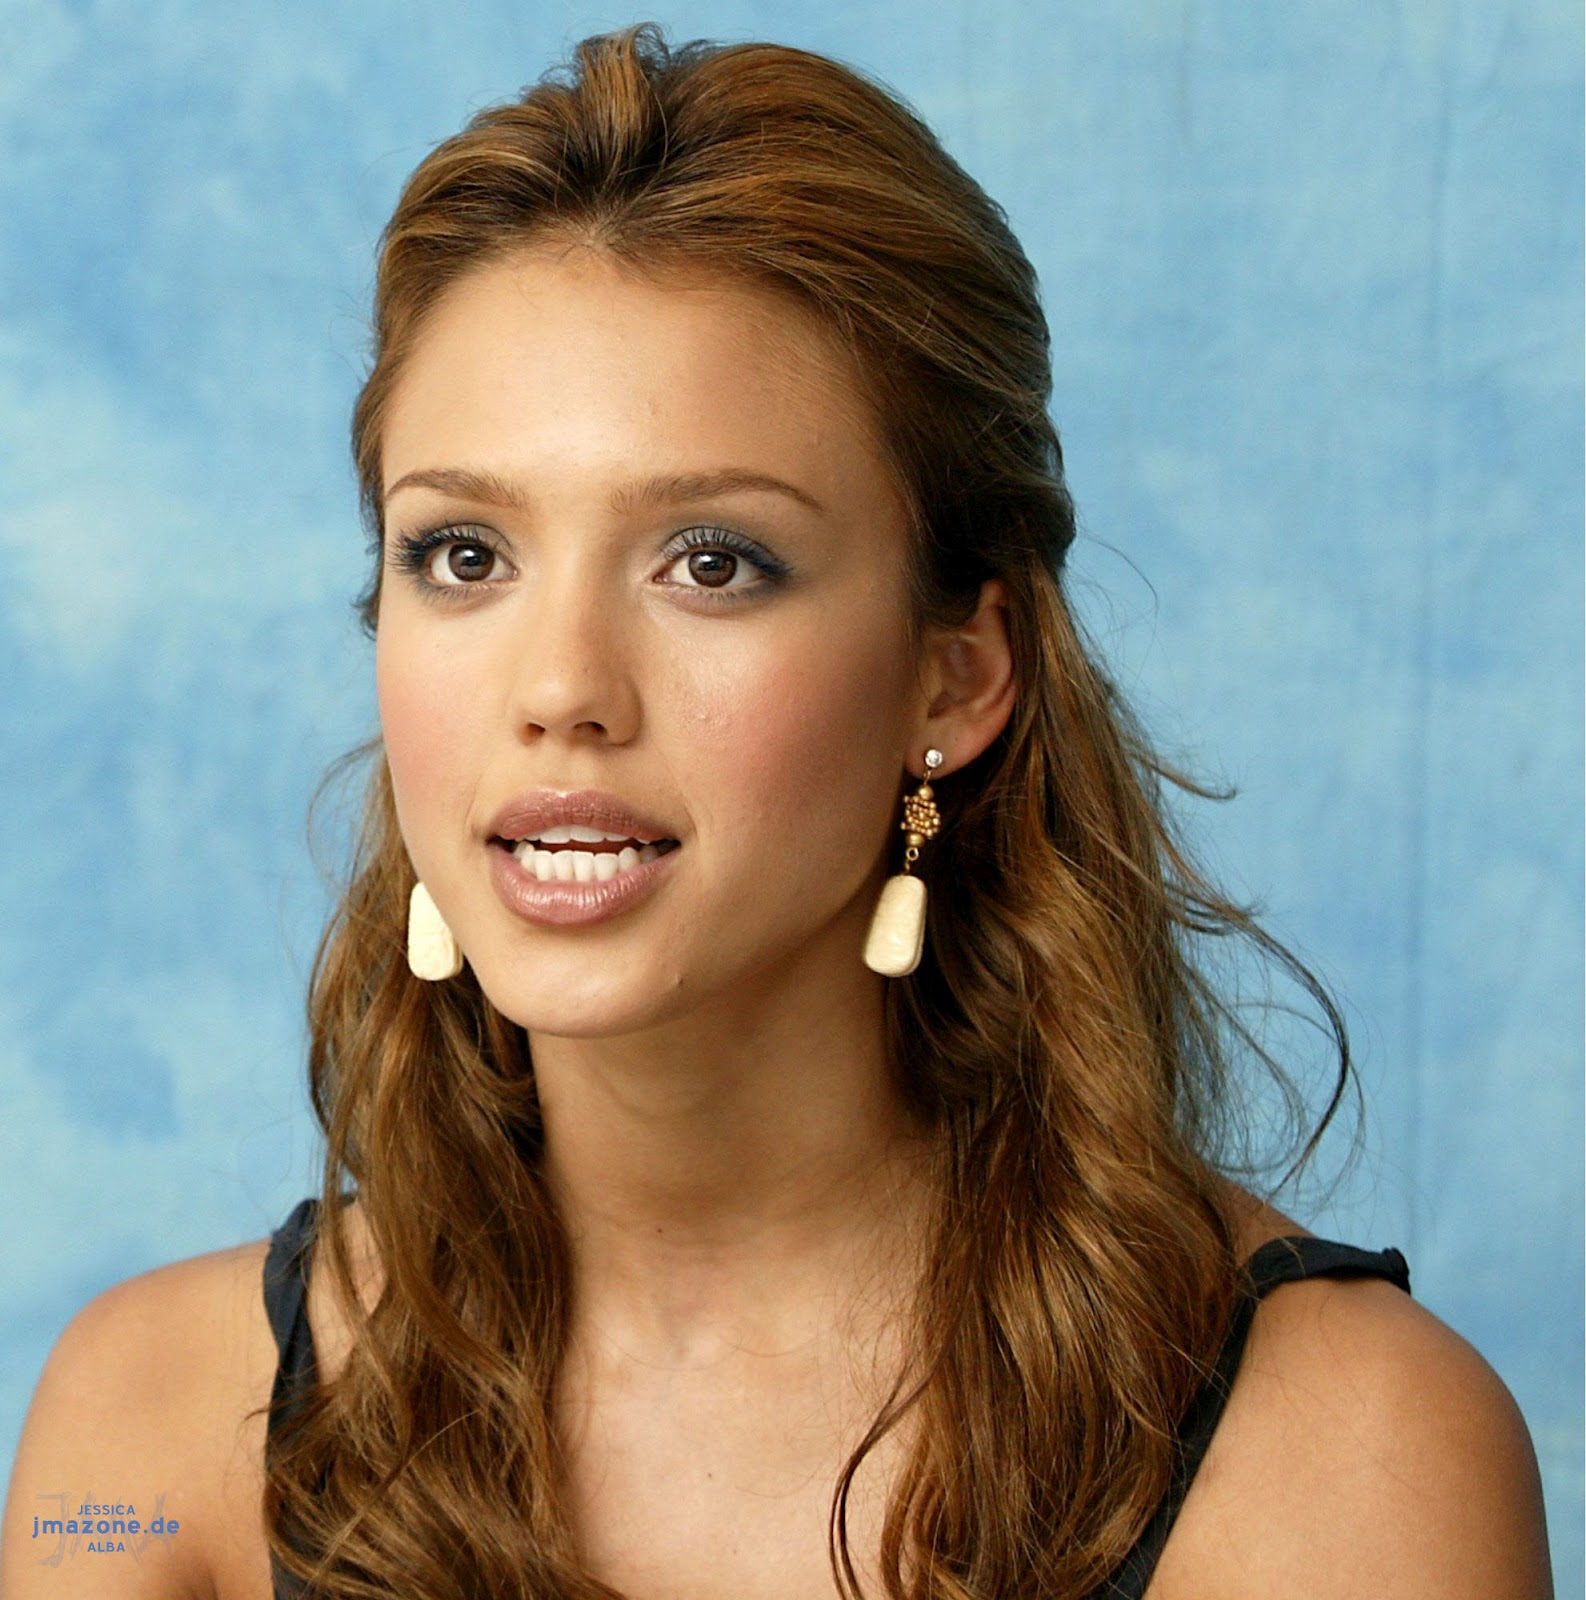 HOLLYWOOD ALL STARS: Jessica Alba Profile, Bio and ...